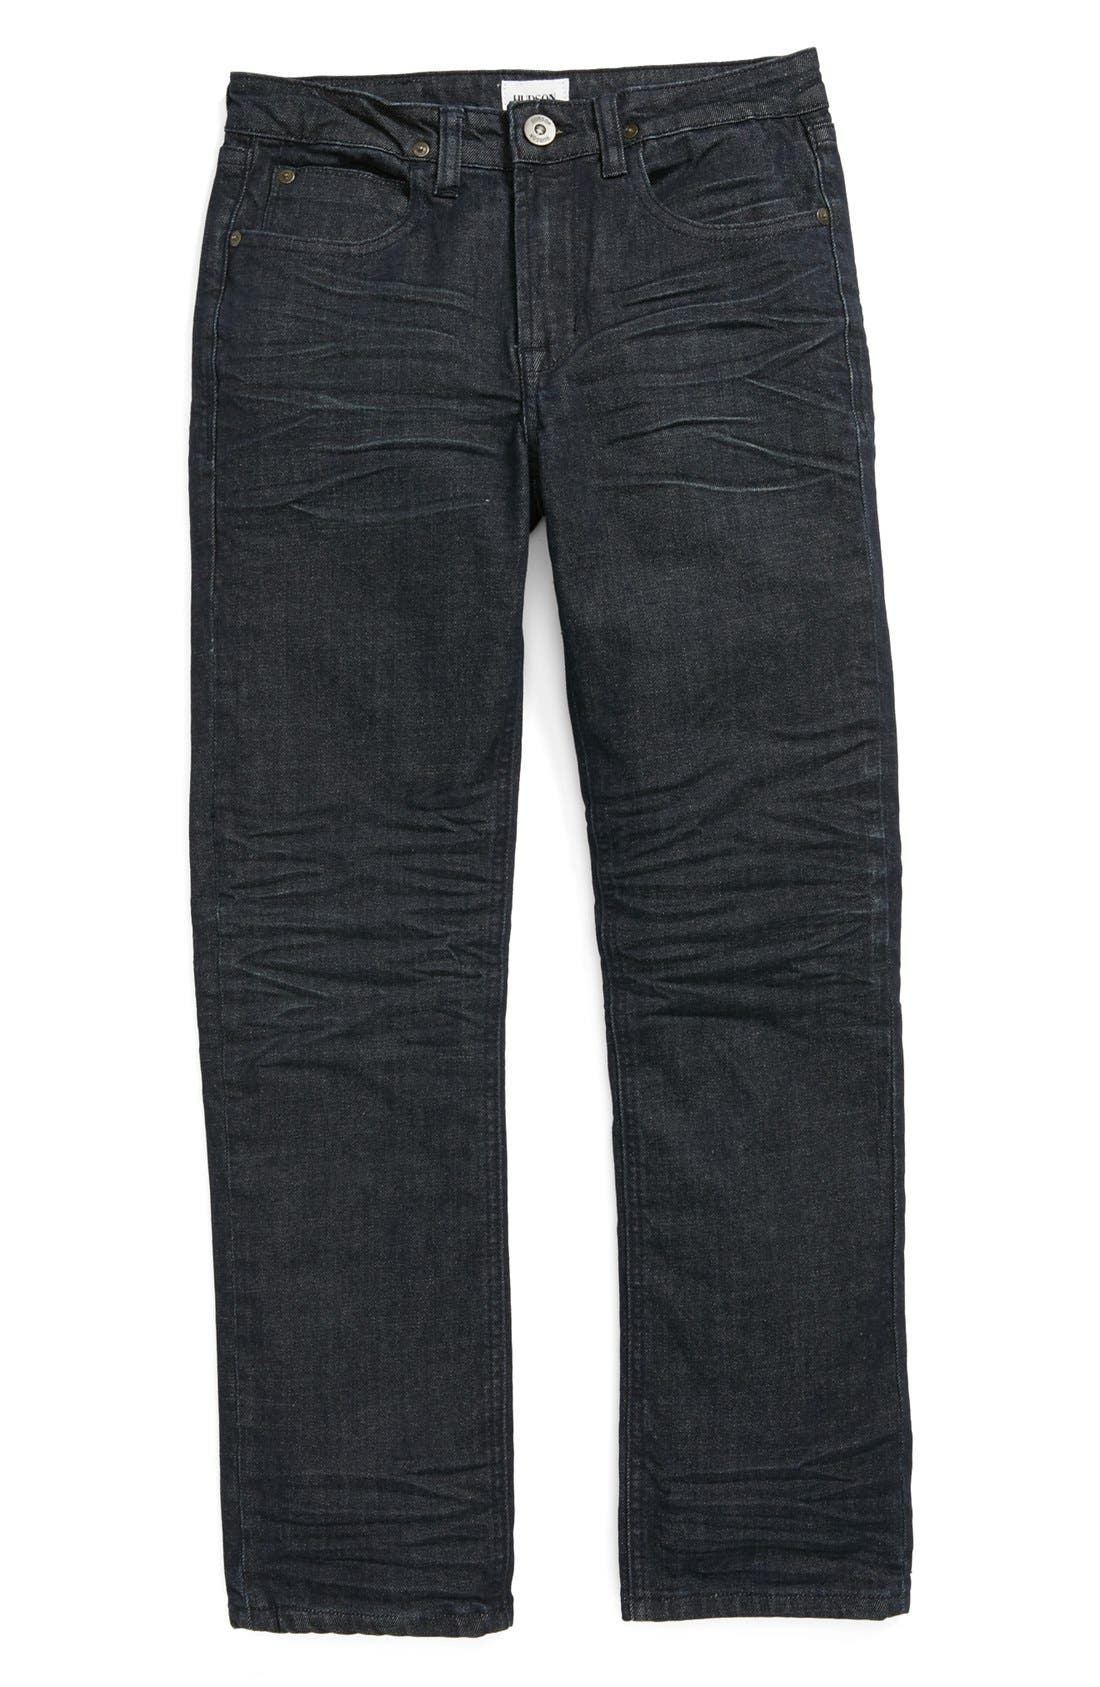 Alternate Image 2  - Hudson Kids 'Parker' Straight Leg Jeans (Little Boys & Big Boys)